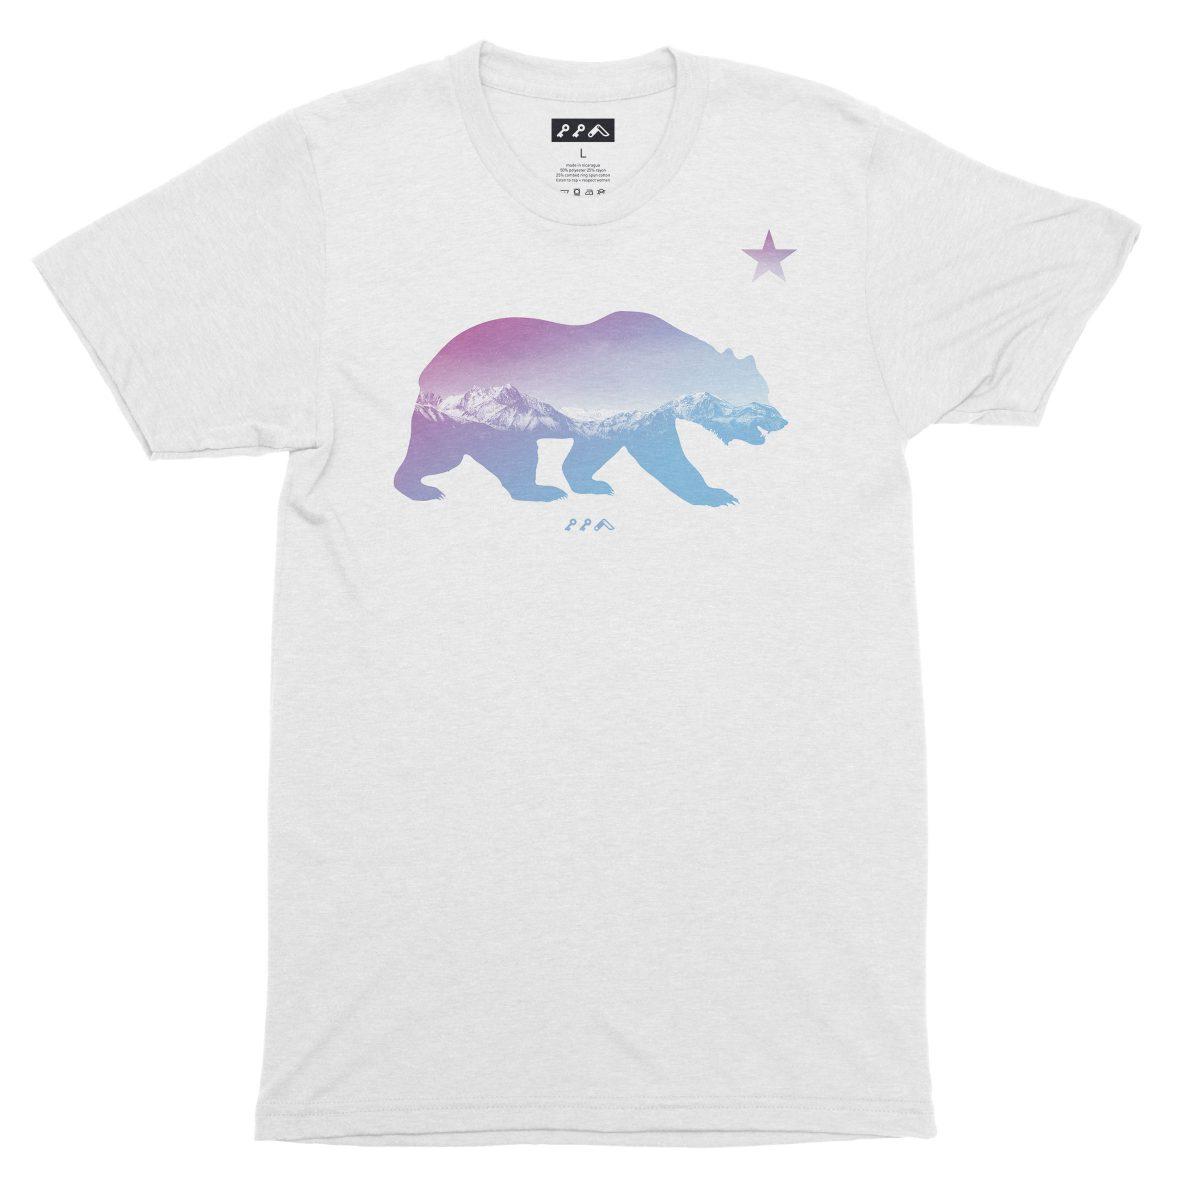 """BARE MOUNTAINS"" california bear t-shirt in white by kikicutt"